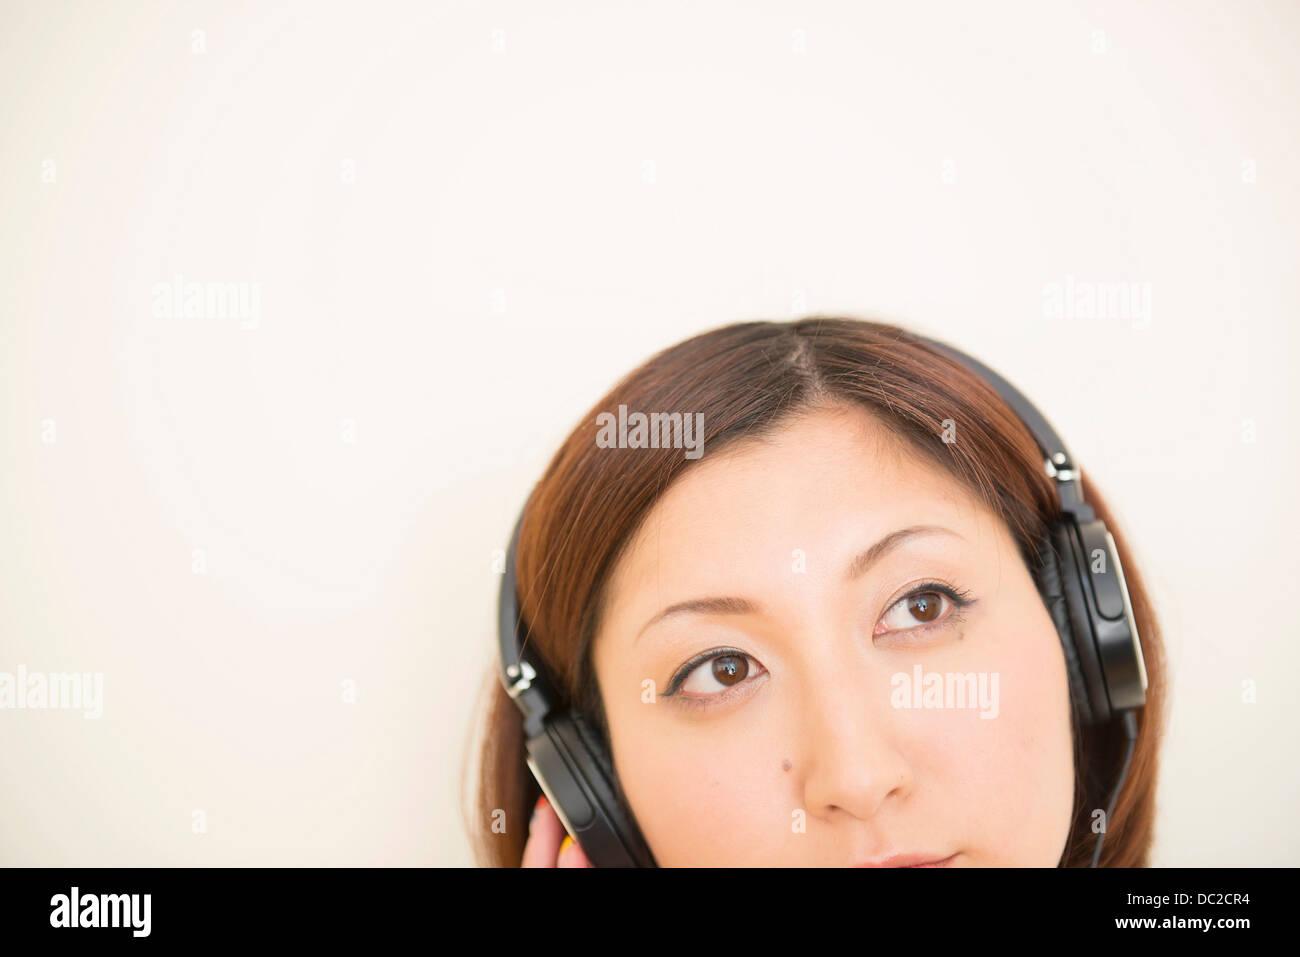 Woman wearing earphones looking upward - Stock Image